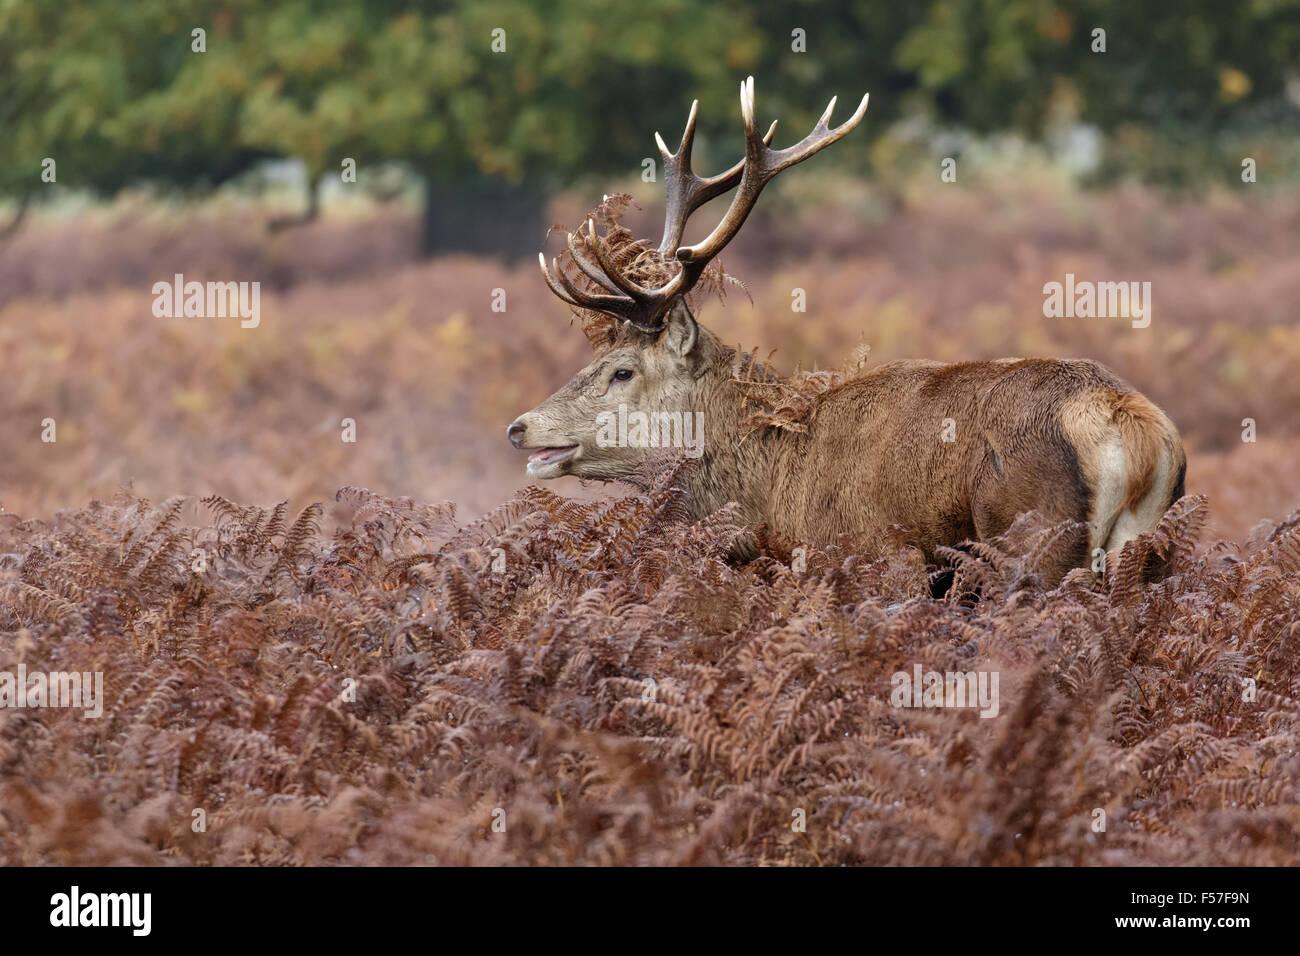 Red Deer rut stag (Cervus elaphus) among the bracken in autumn. - Stock Image